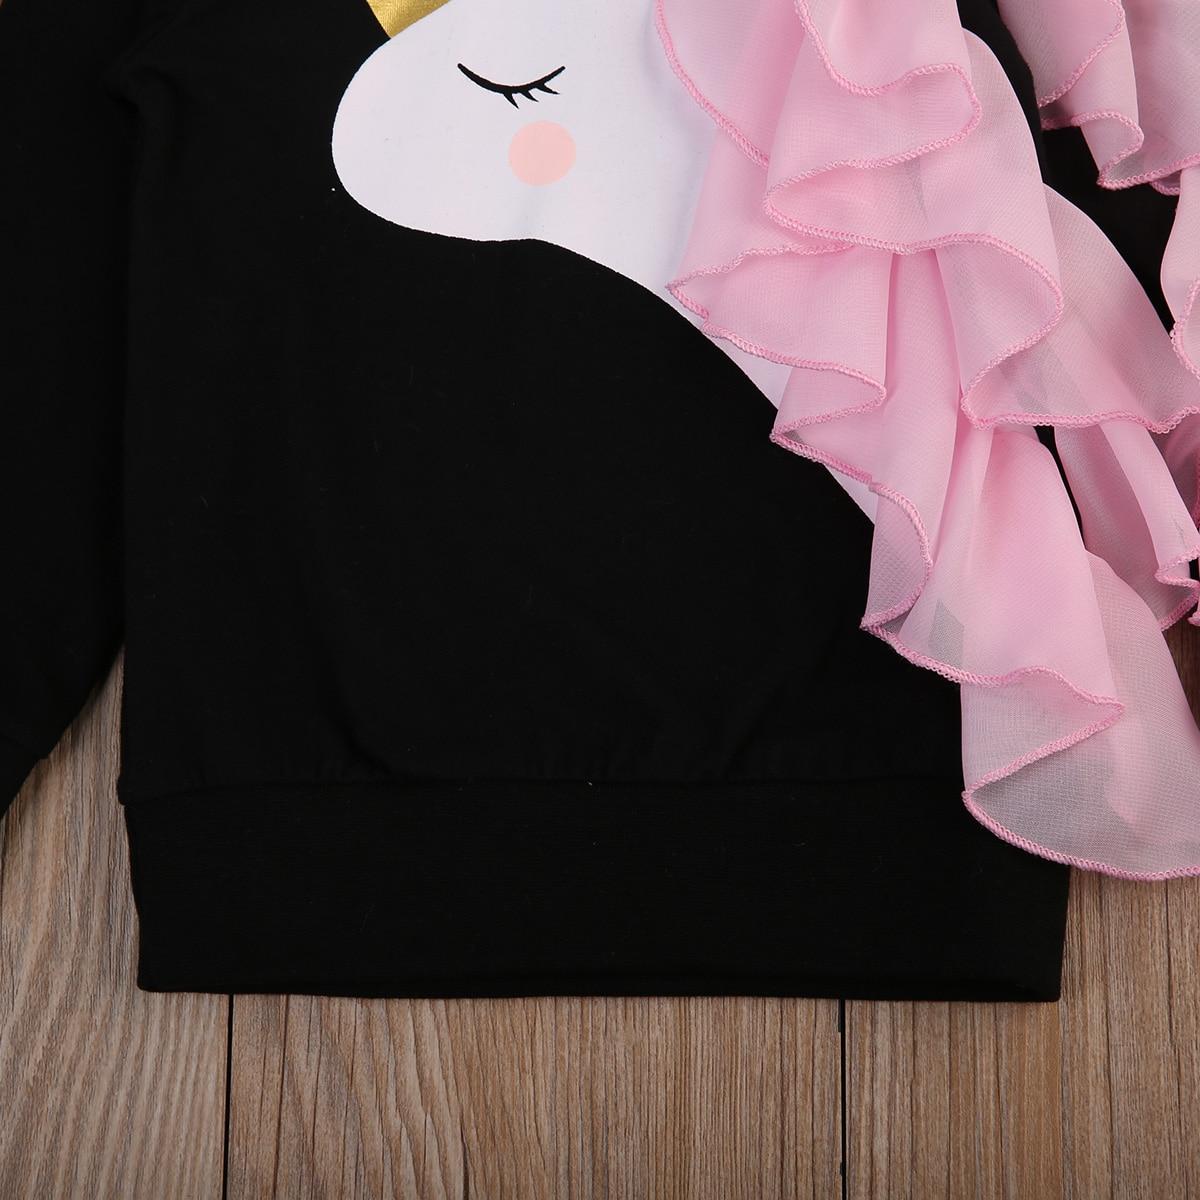 2020 Autumn Winter Kids Hoodies Baby Girls Unicorn Printed Sweatshirt Children Long Sleeve Cotton Tops Clothes 0-7 Years 5